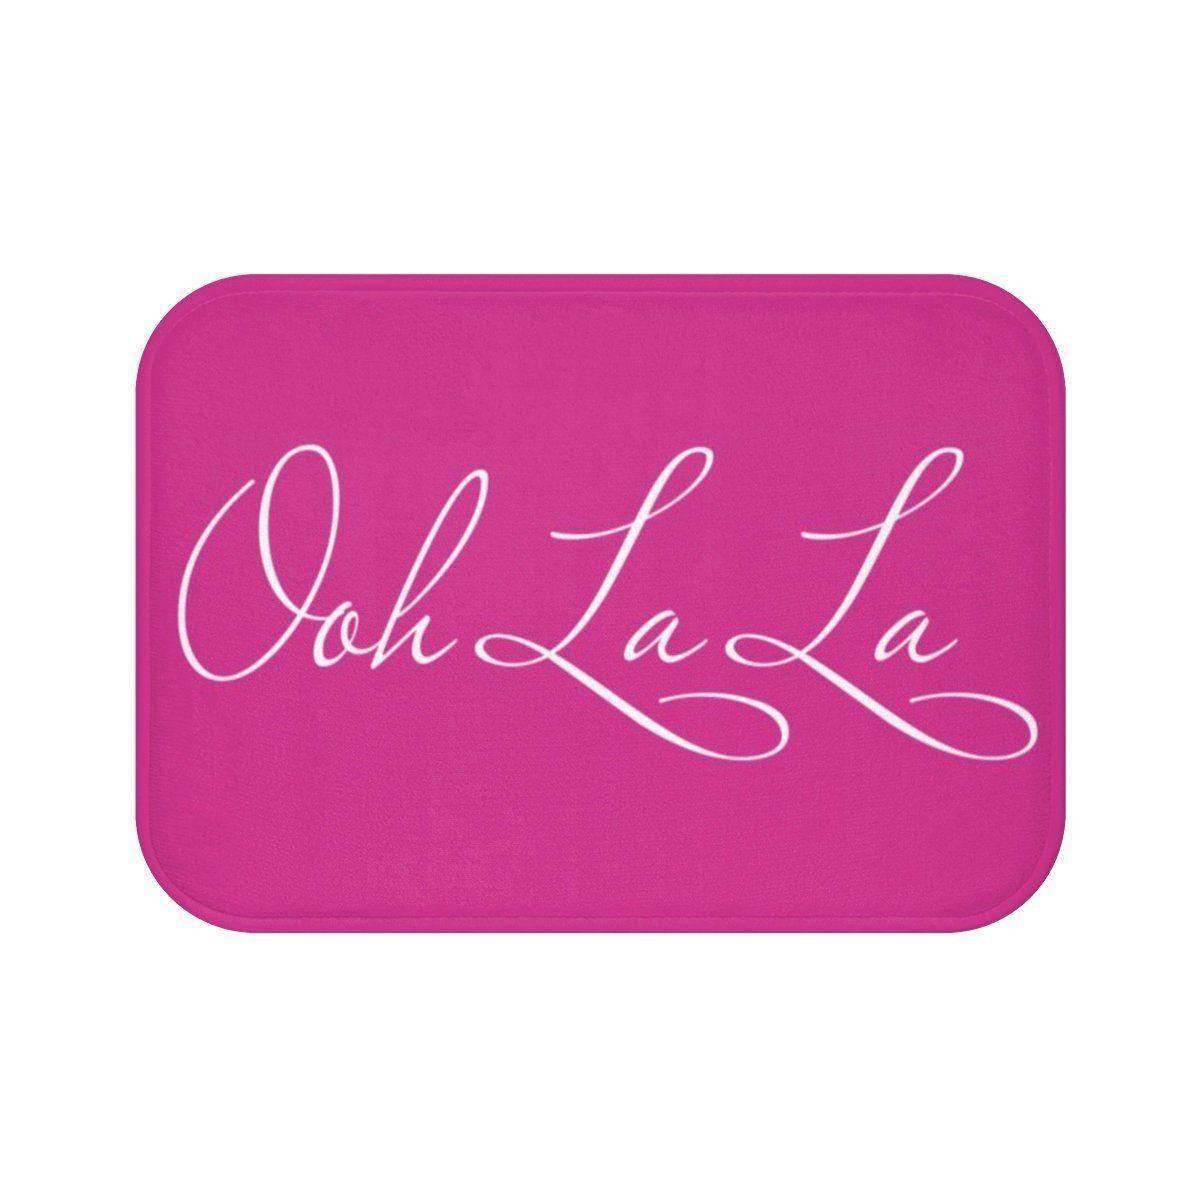 Ooh La La Pink Bath Mat Girl Pink Bath Decor Bath Mat With